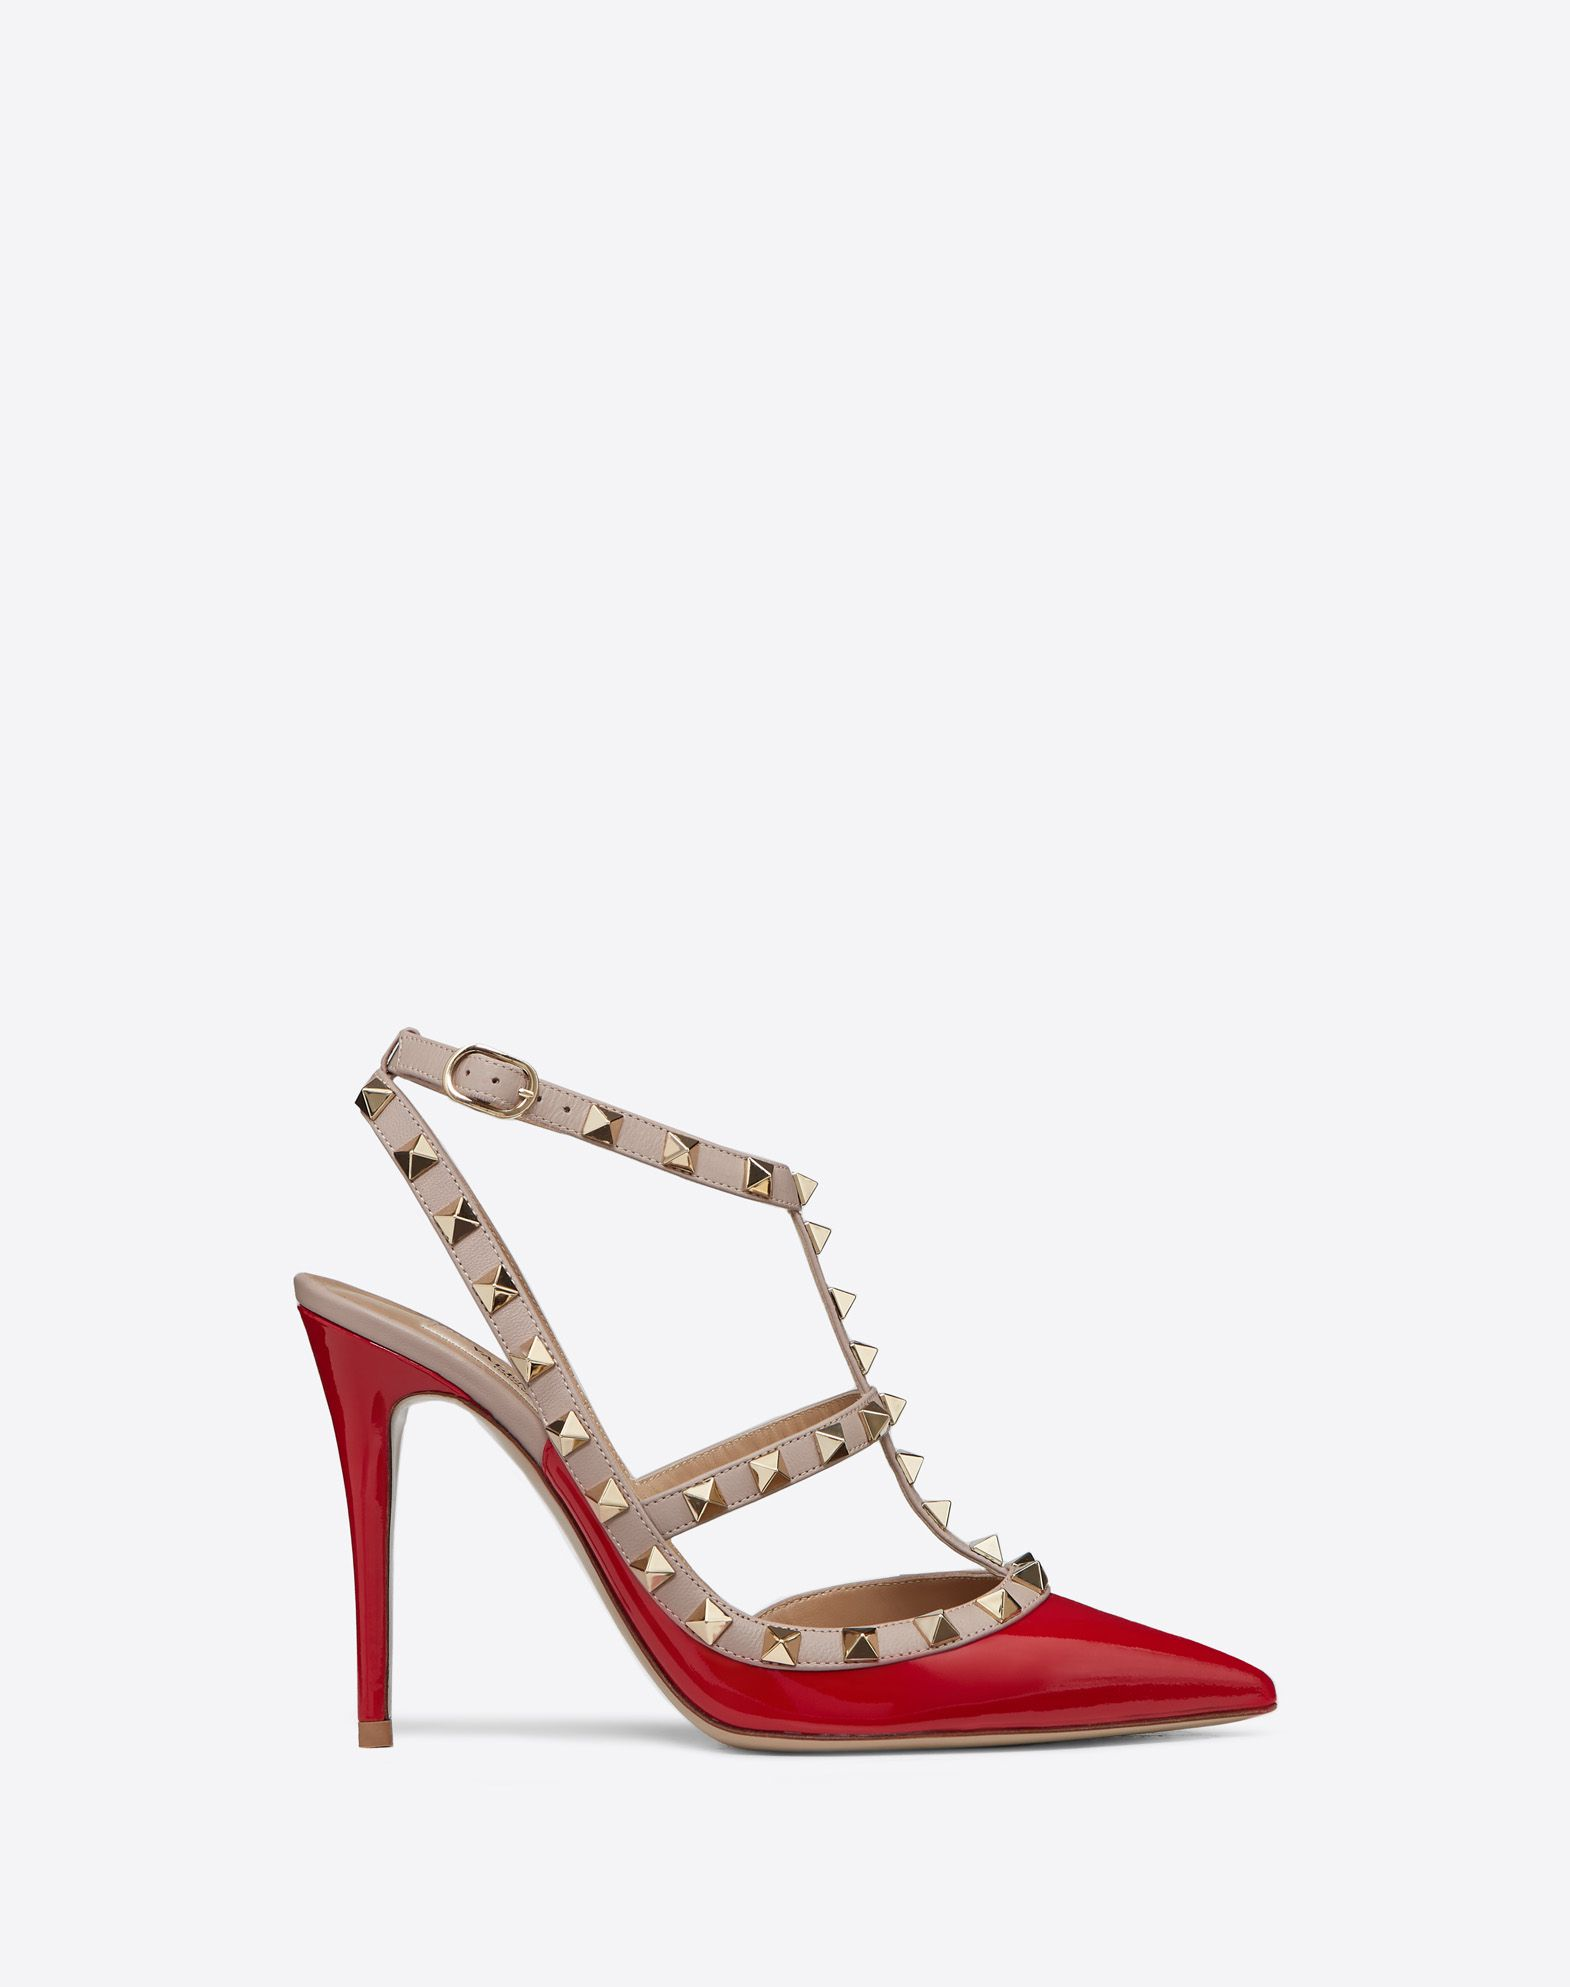 Or Sandales-bride À La Cheville Valentino Rouge 6xV1aT0